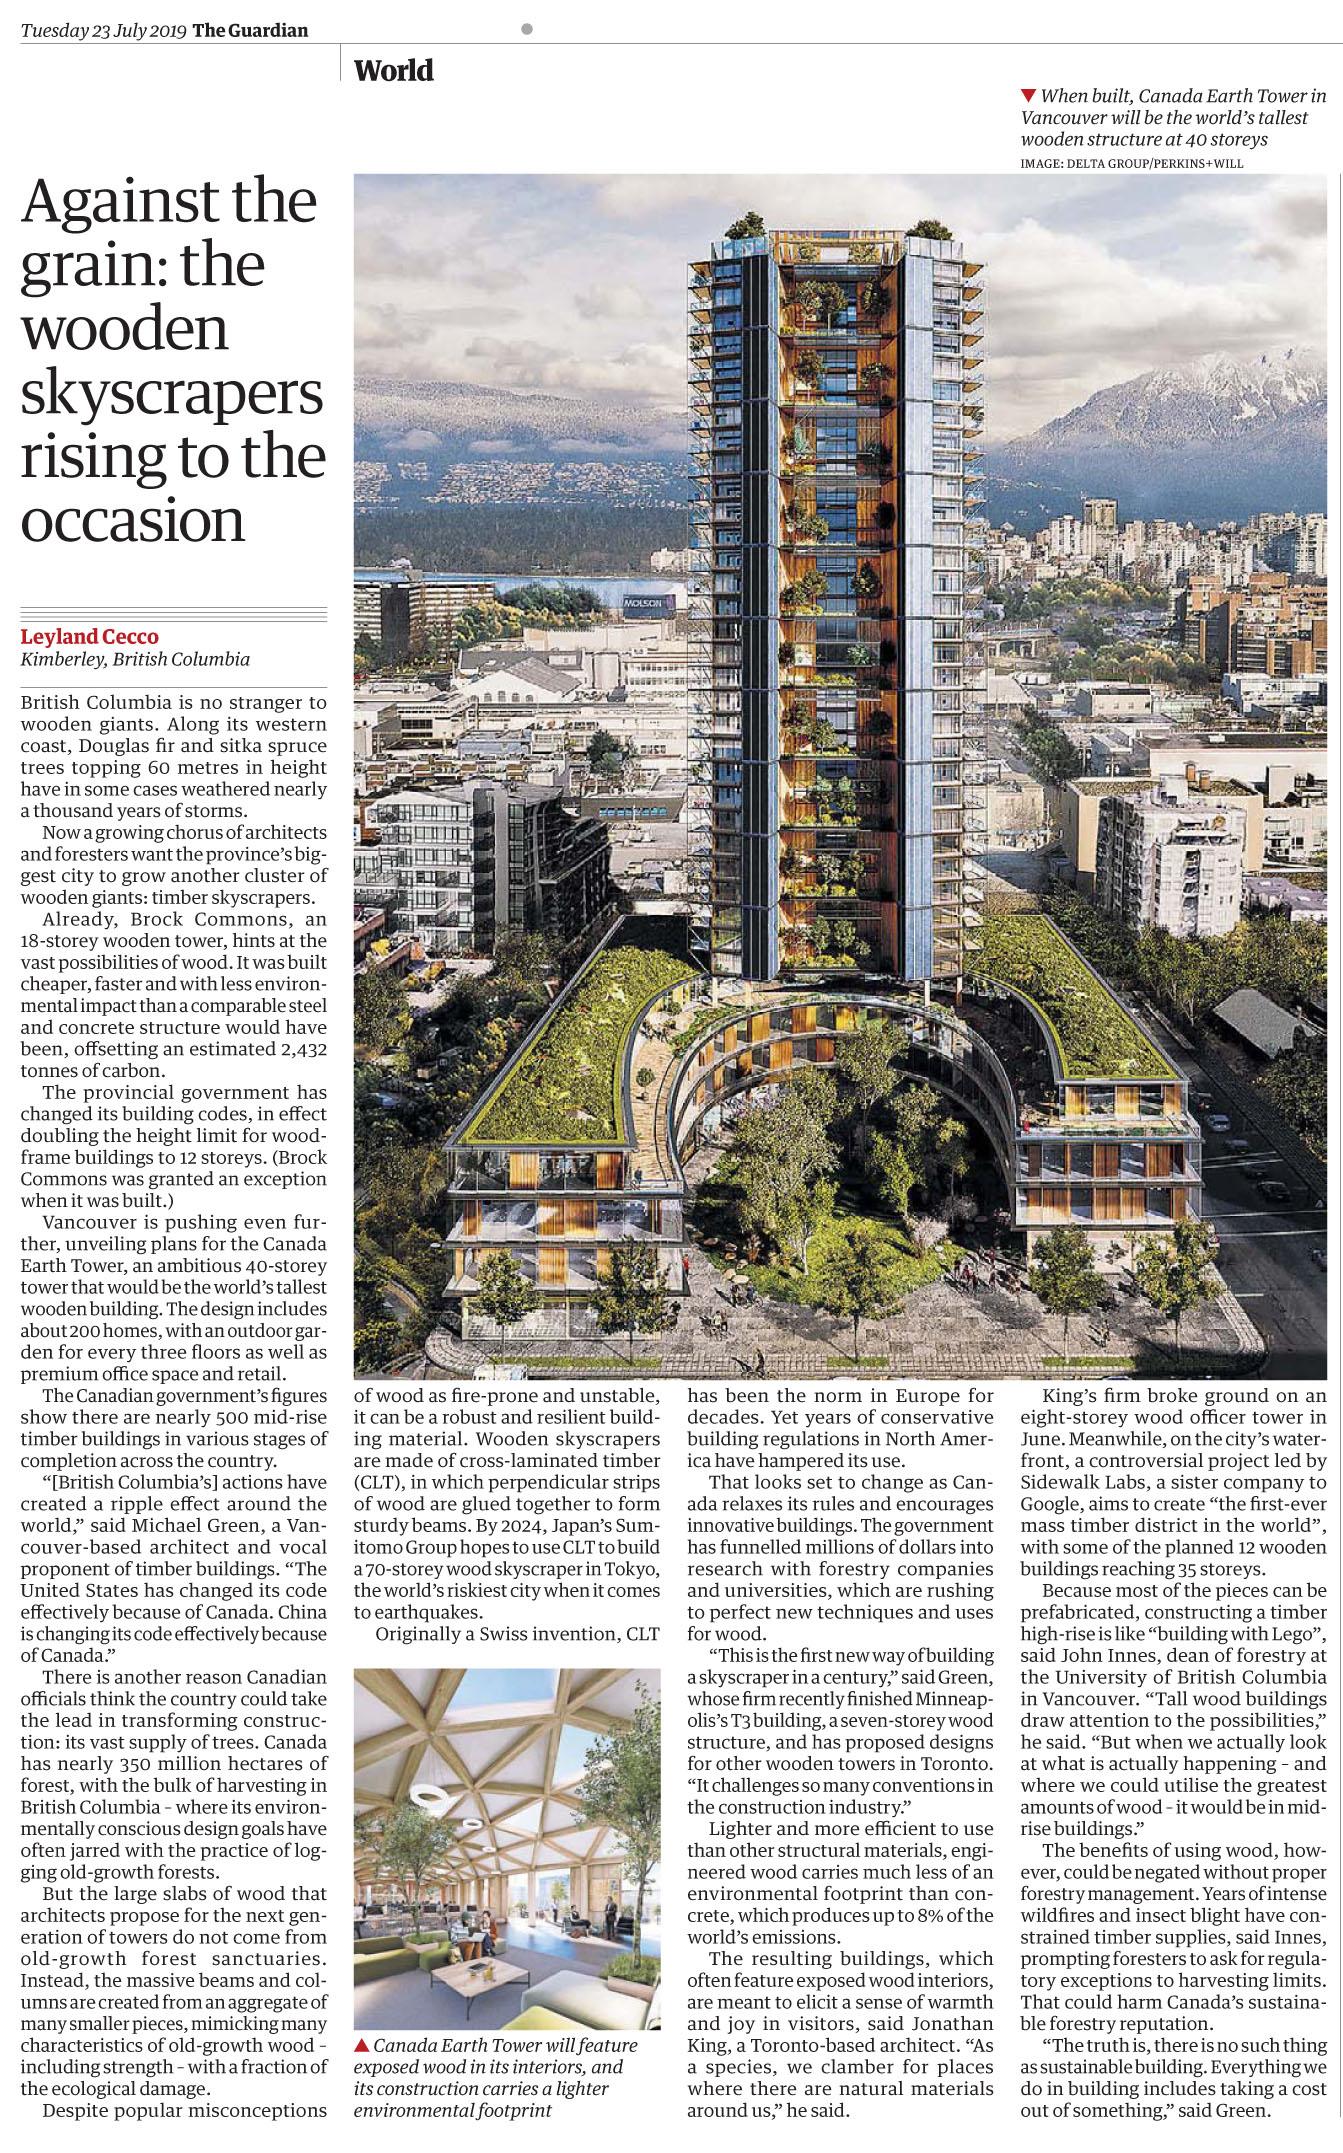 The Guardian  July 23 2019 Wood 40-storey2.jpg